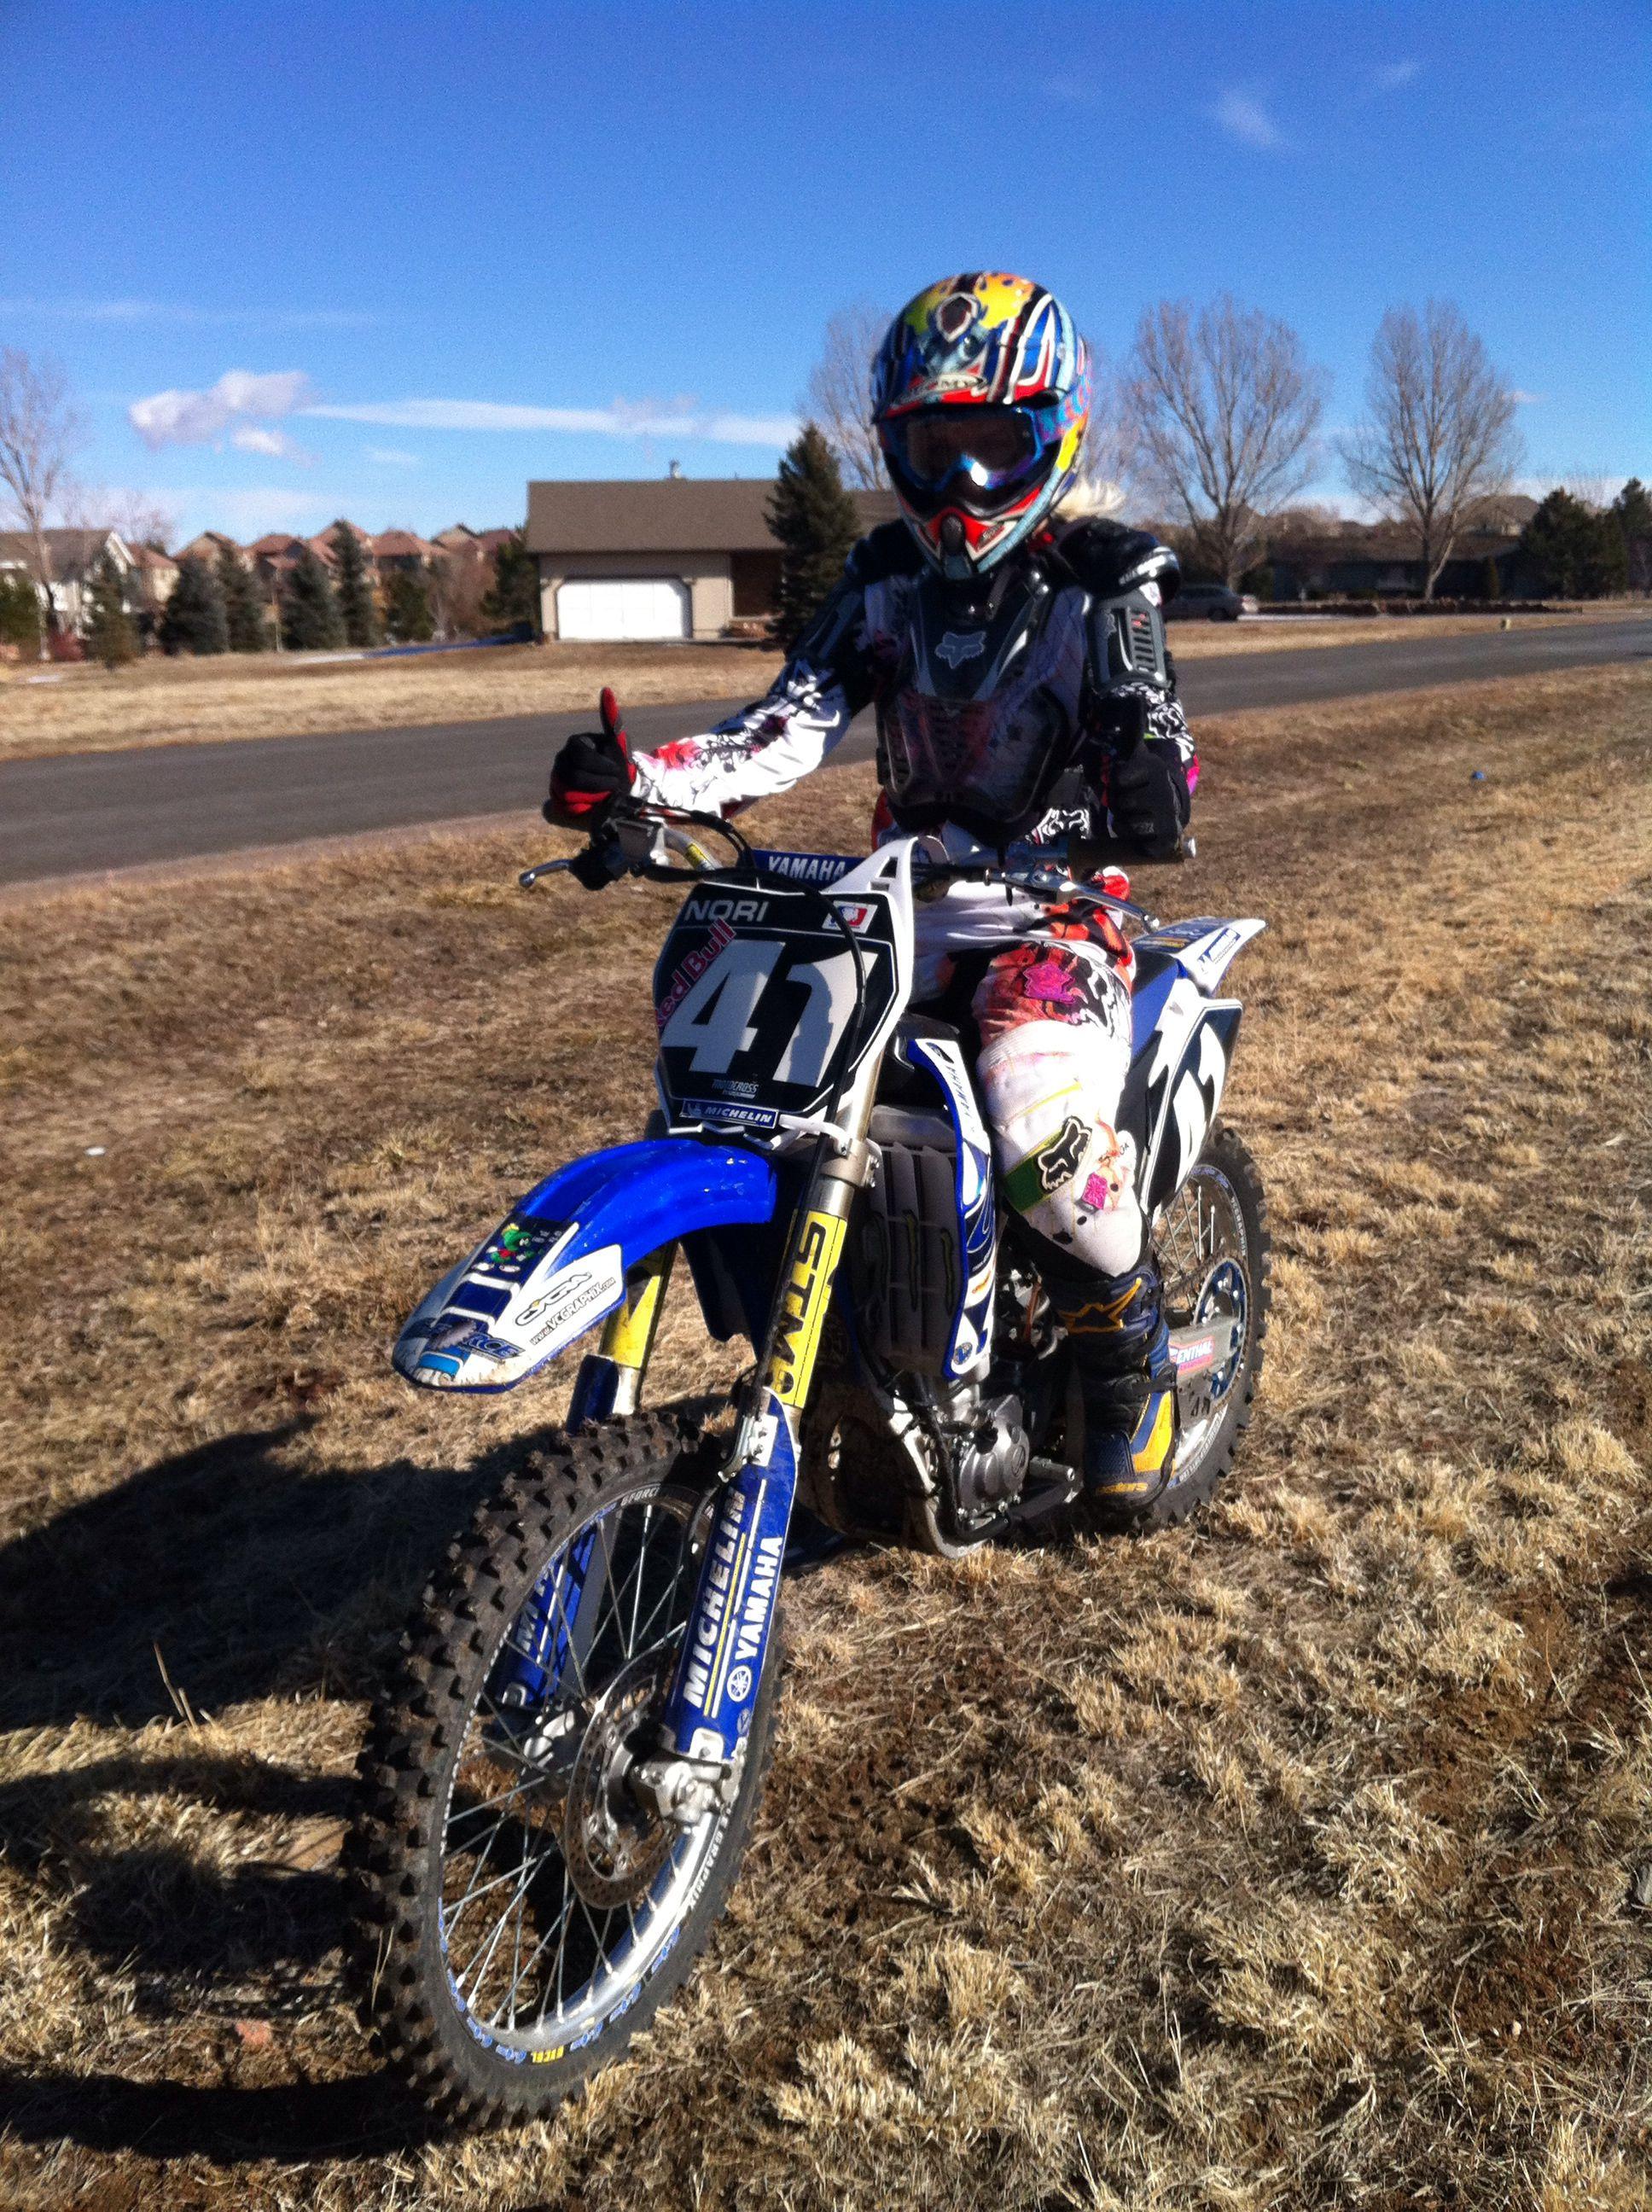 Pin By Tamara Johnston On Motorcycle Racing And Our Umbrella Girl Dirt Bike Girl Bikes Girls Motocross